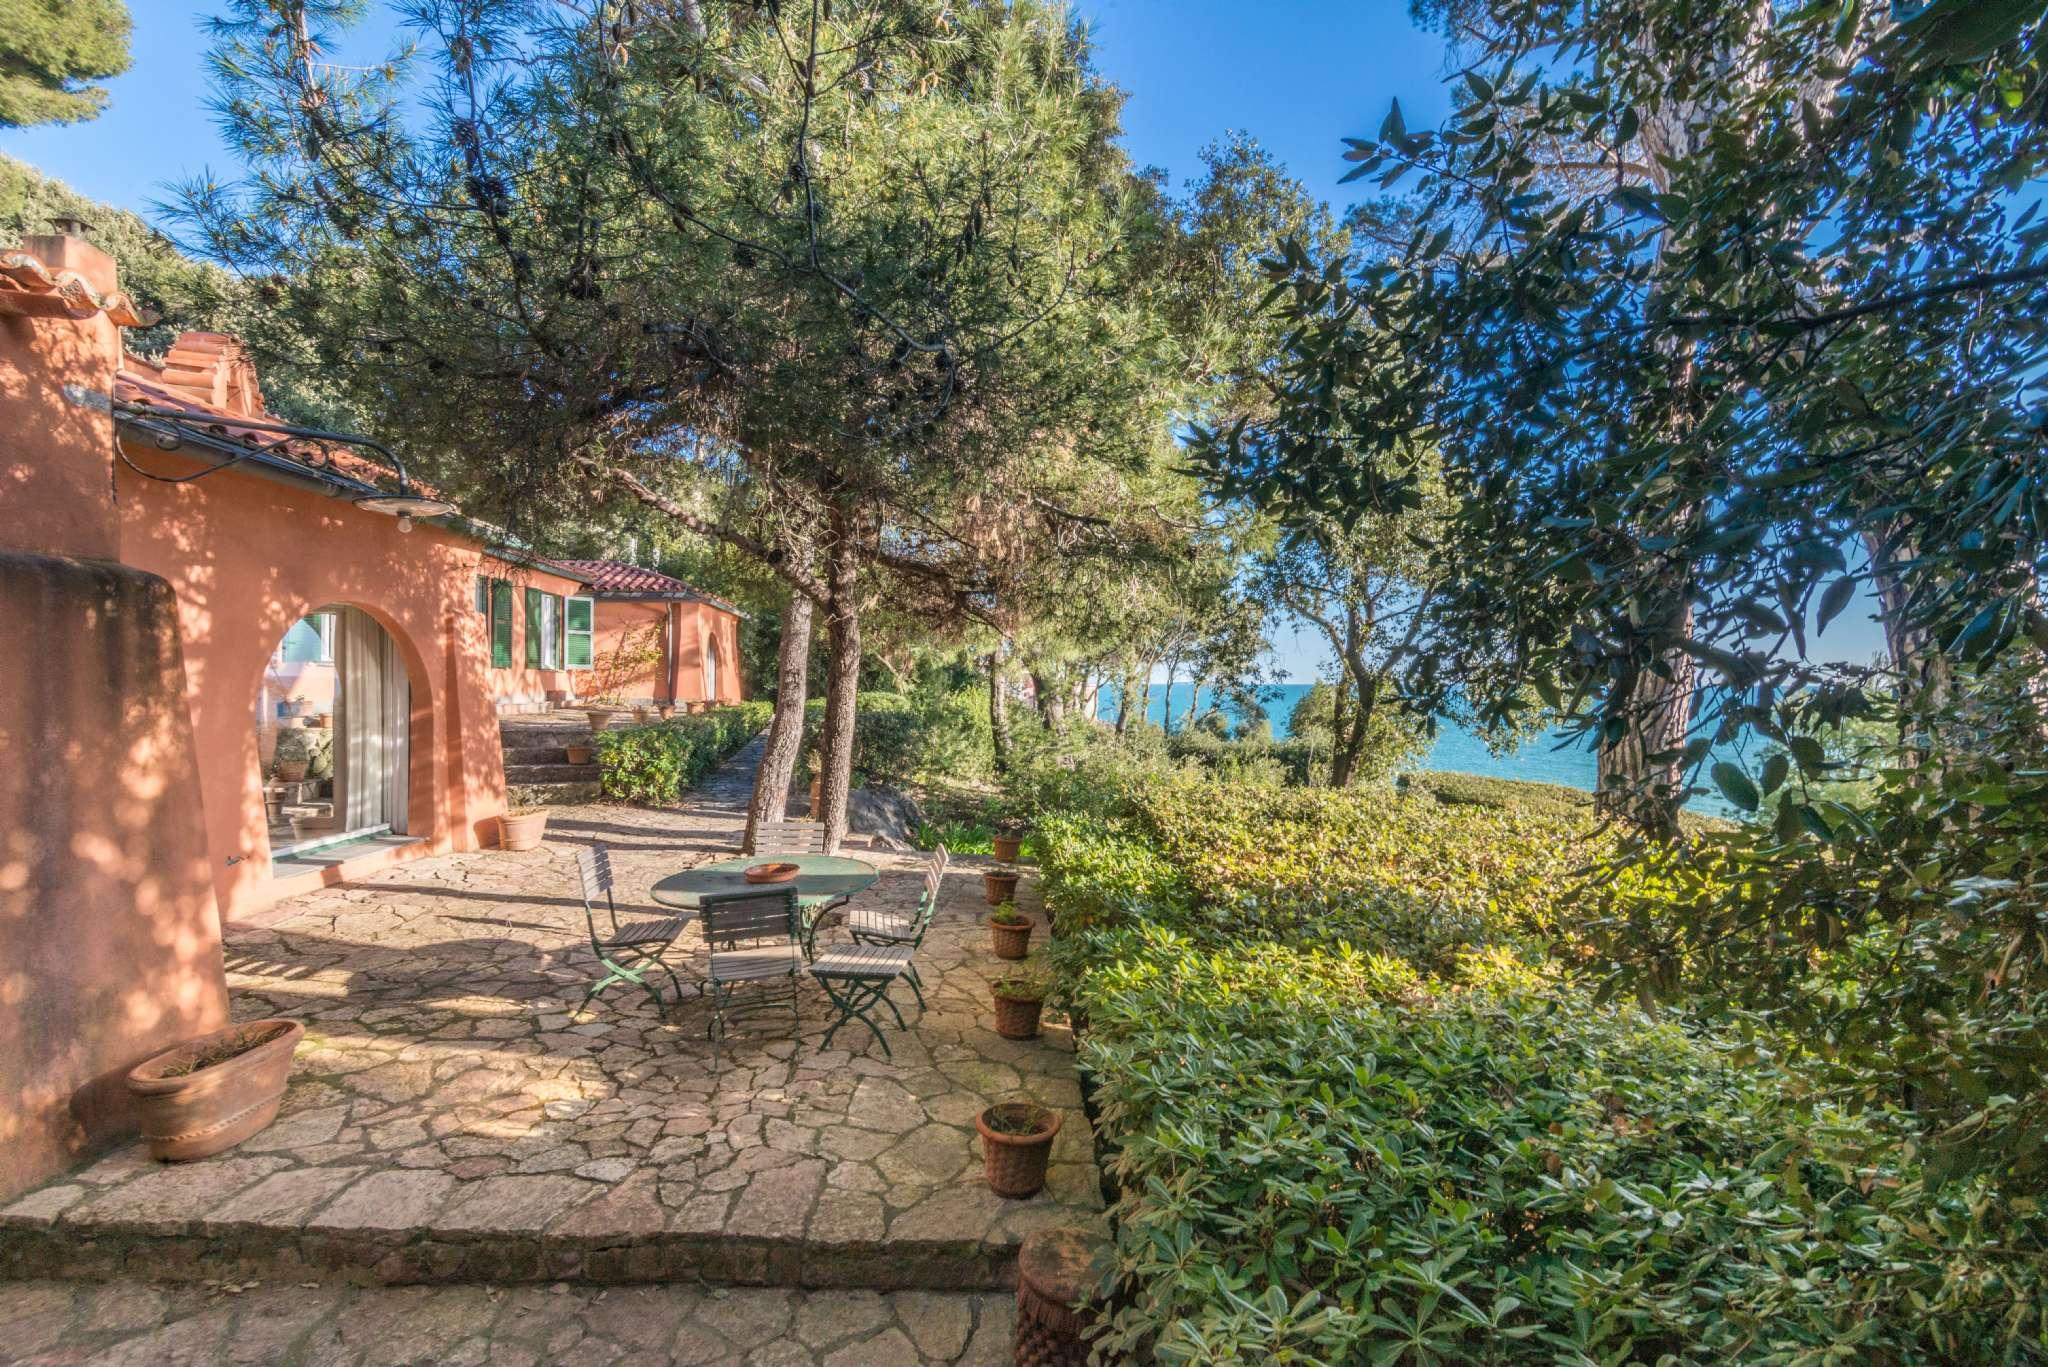 Villa in Vendita a Lerici: 5 locali, 340 mq - Foto 4